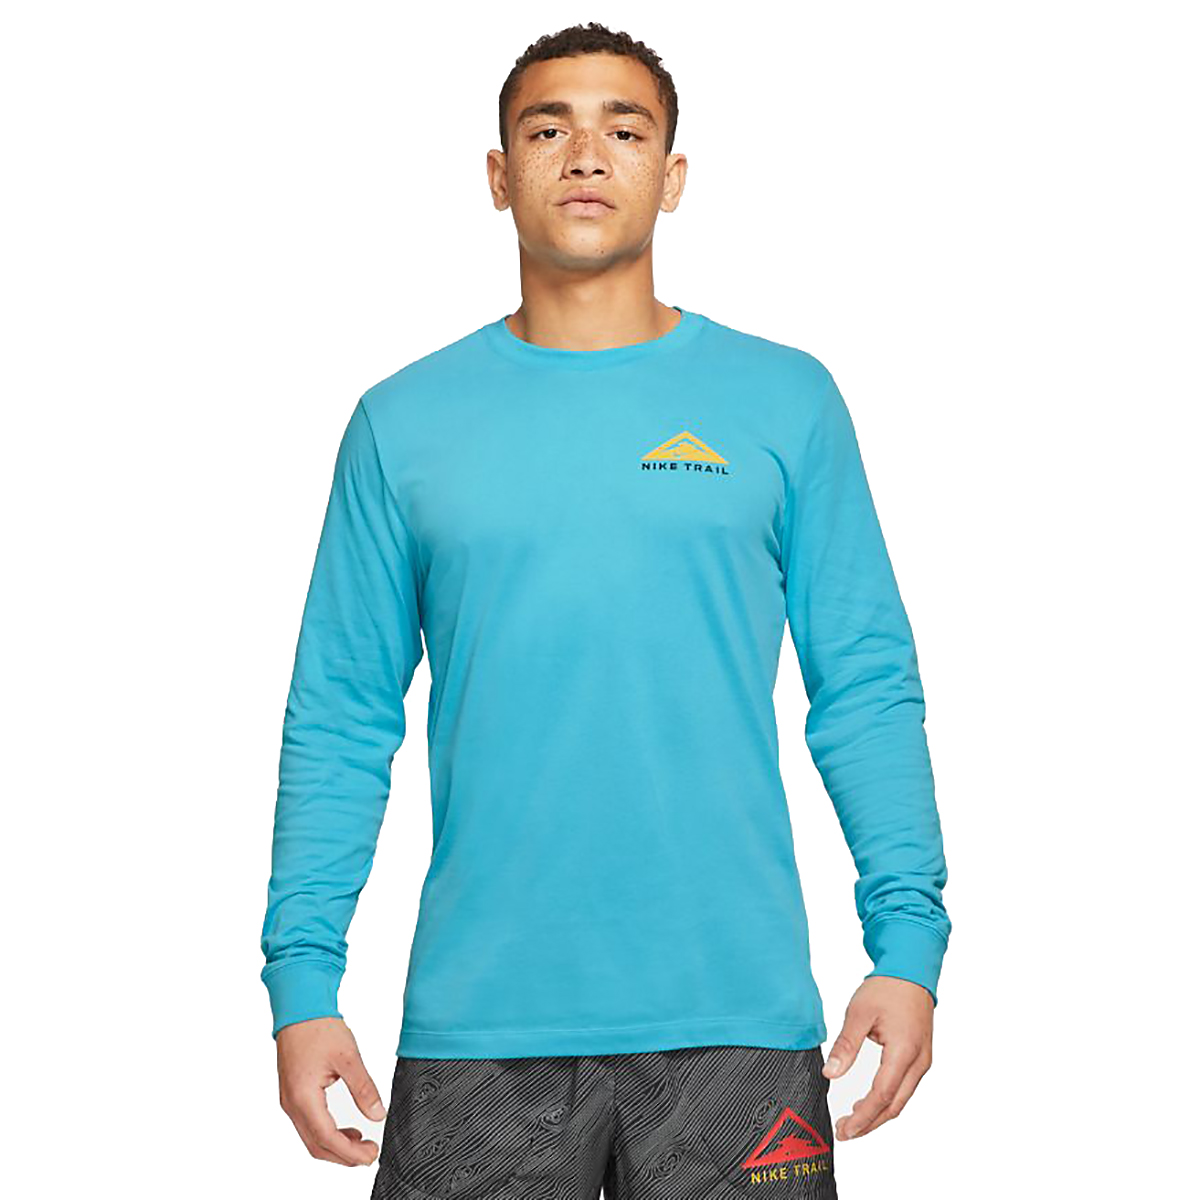 Men's Nike Dri-FIT Long-Sleeve Trail Running T-Shirt, , large, image 1